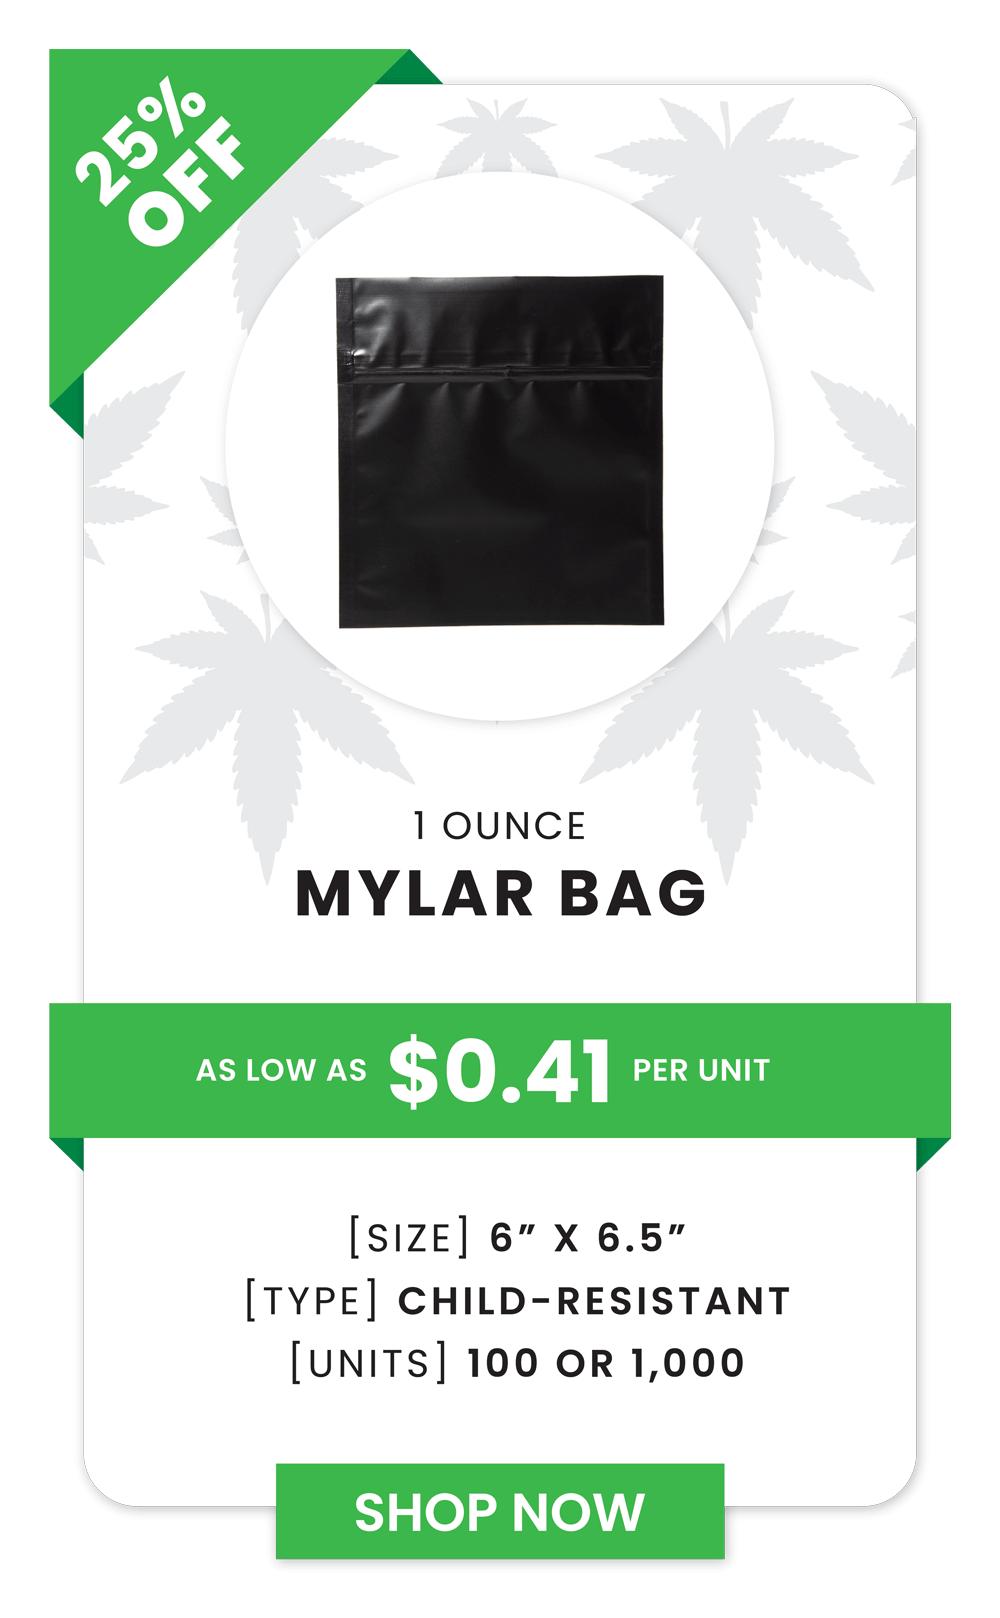 DSC-dispensary-supply-canada-sales-mylar-bag-ounce